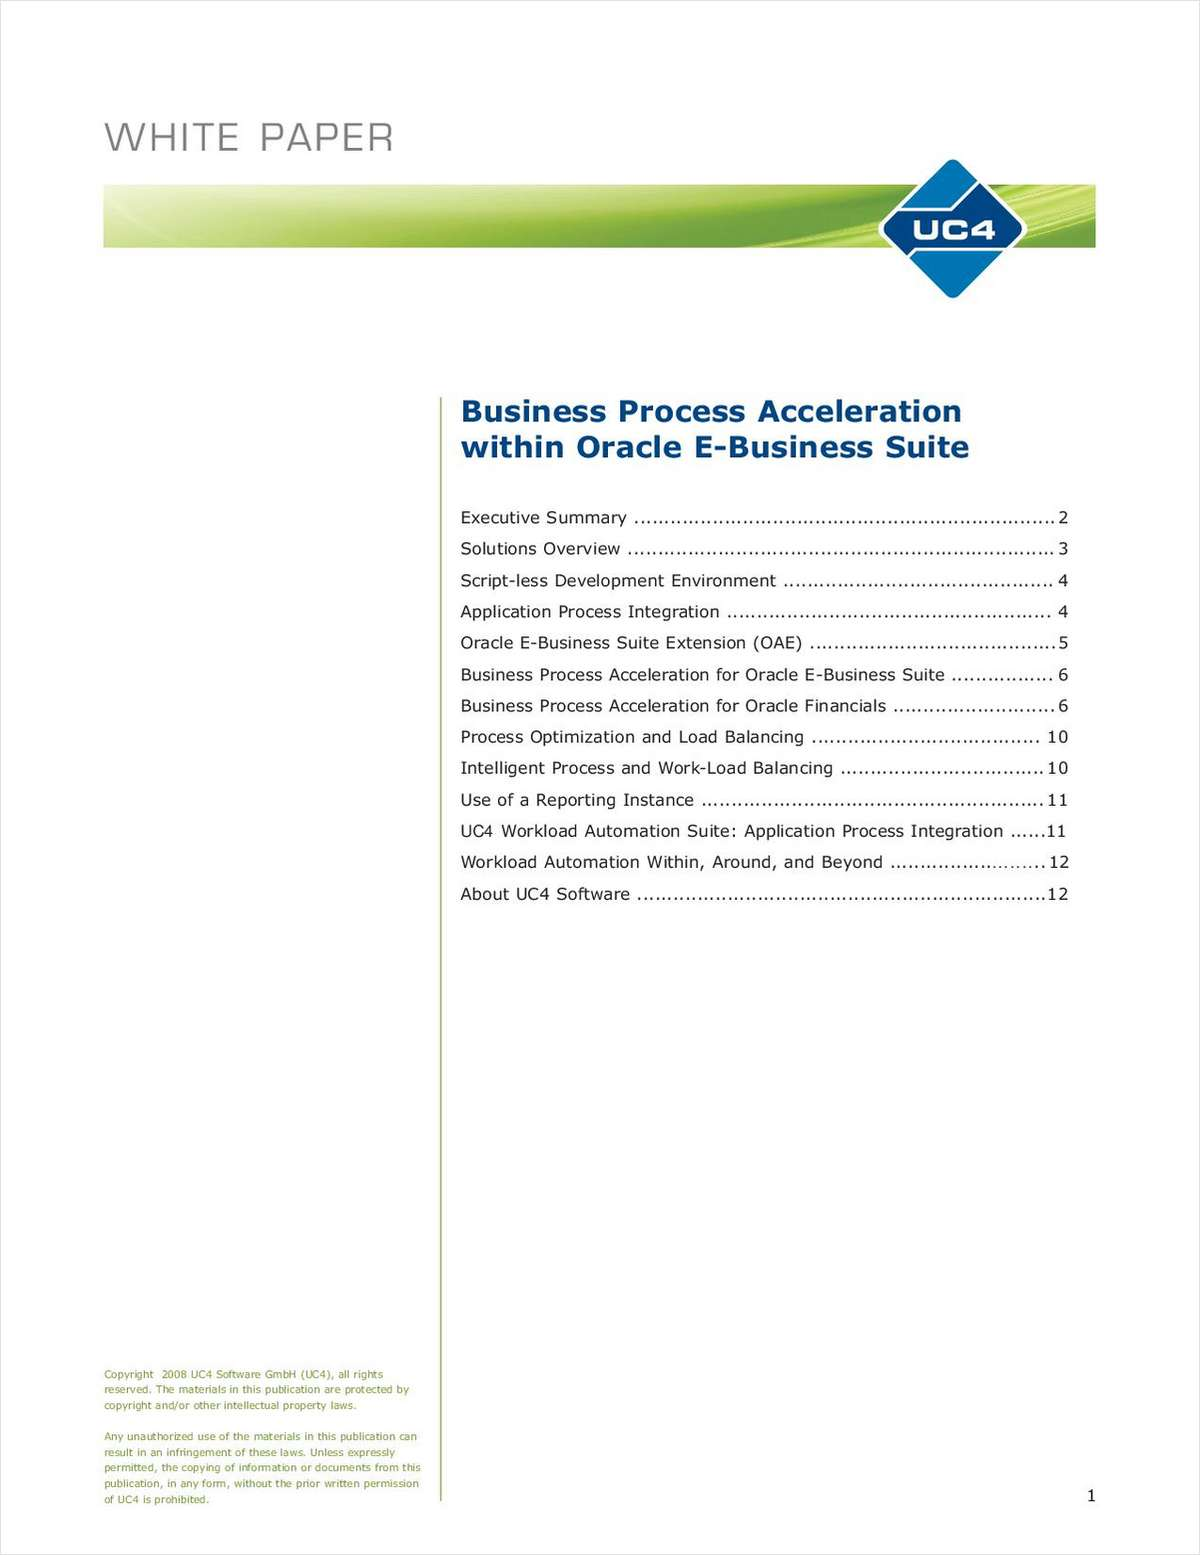 Oracle E-Business Suite: Business Process Acceleration